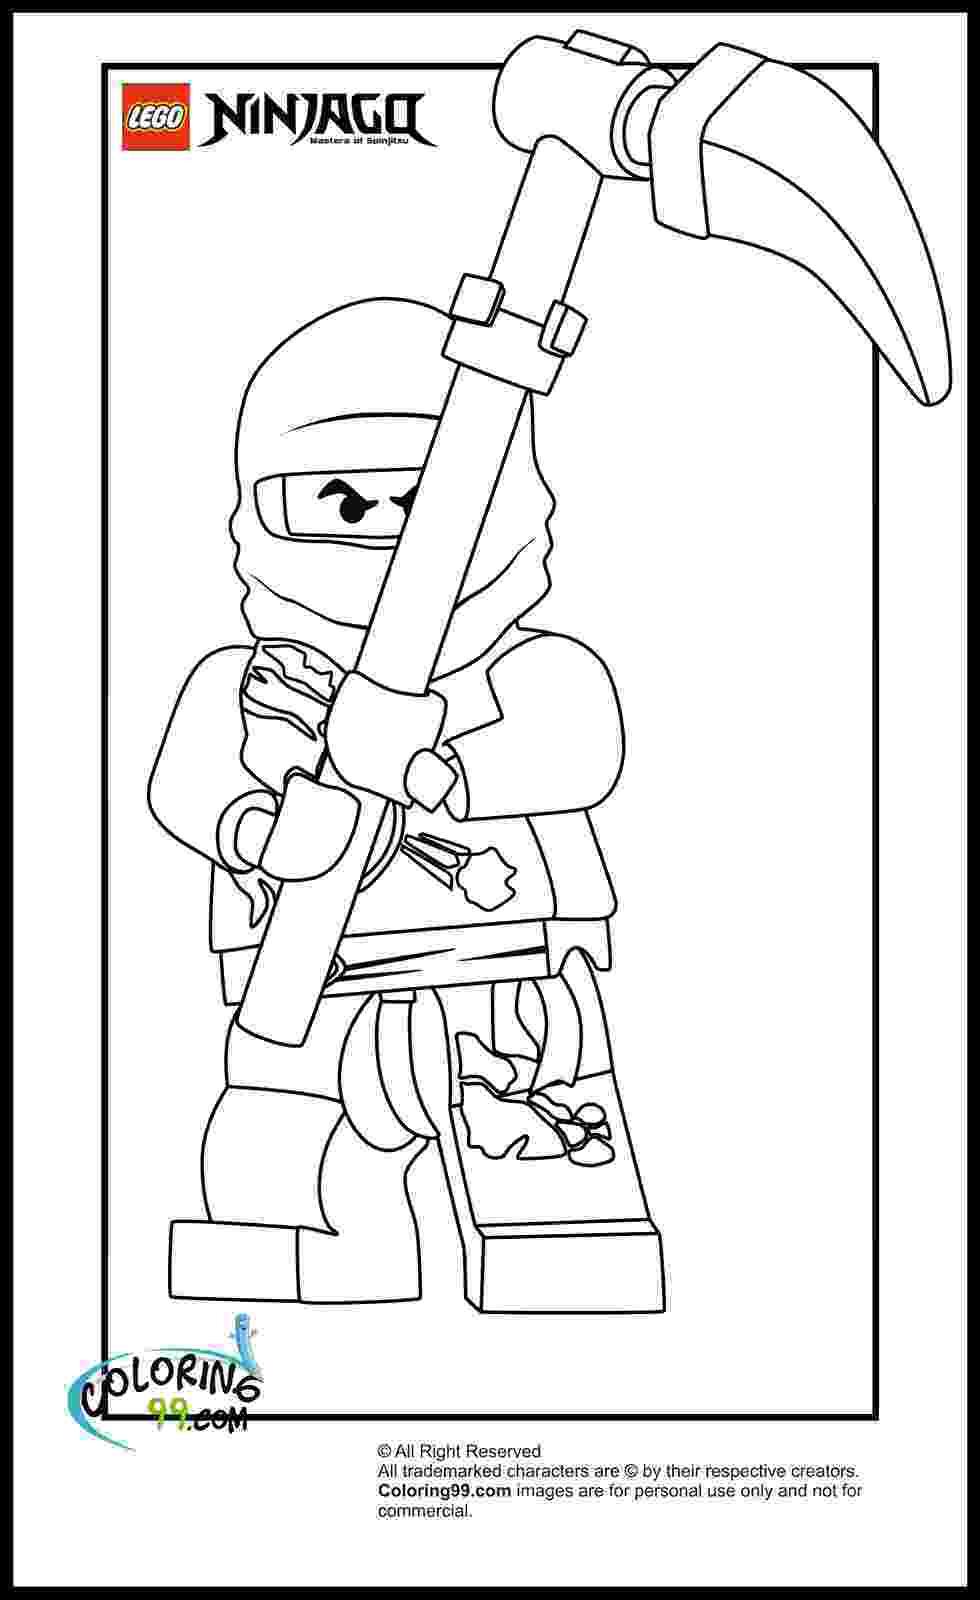 ninjago colouring pages online lego ninjago coloring page morro the brick show online colouring ninjago pages